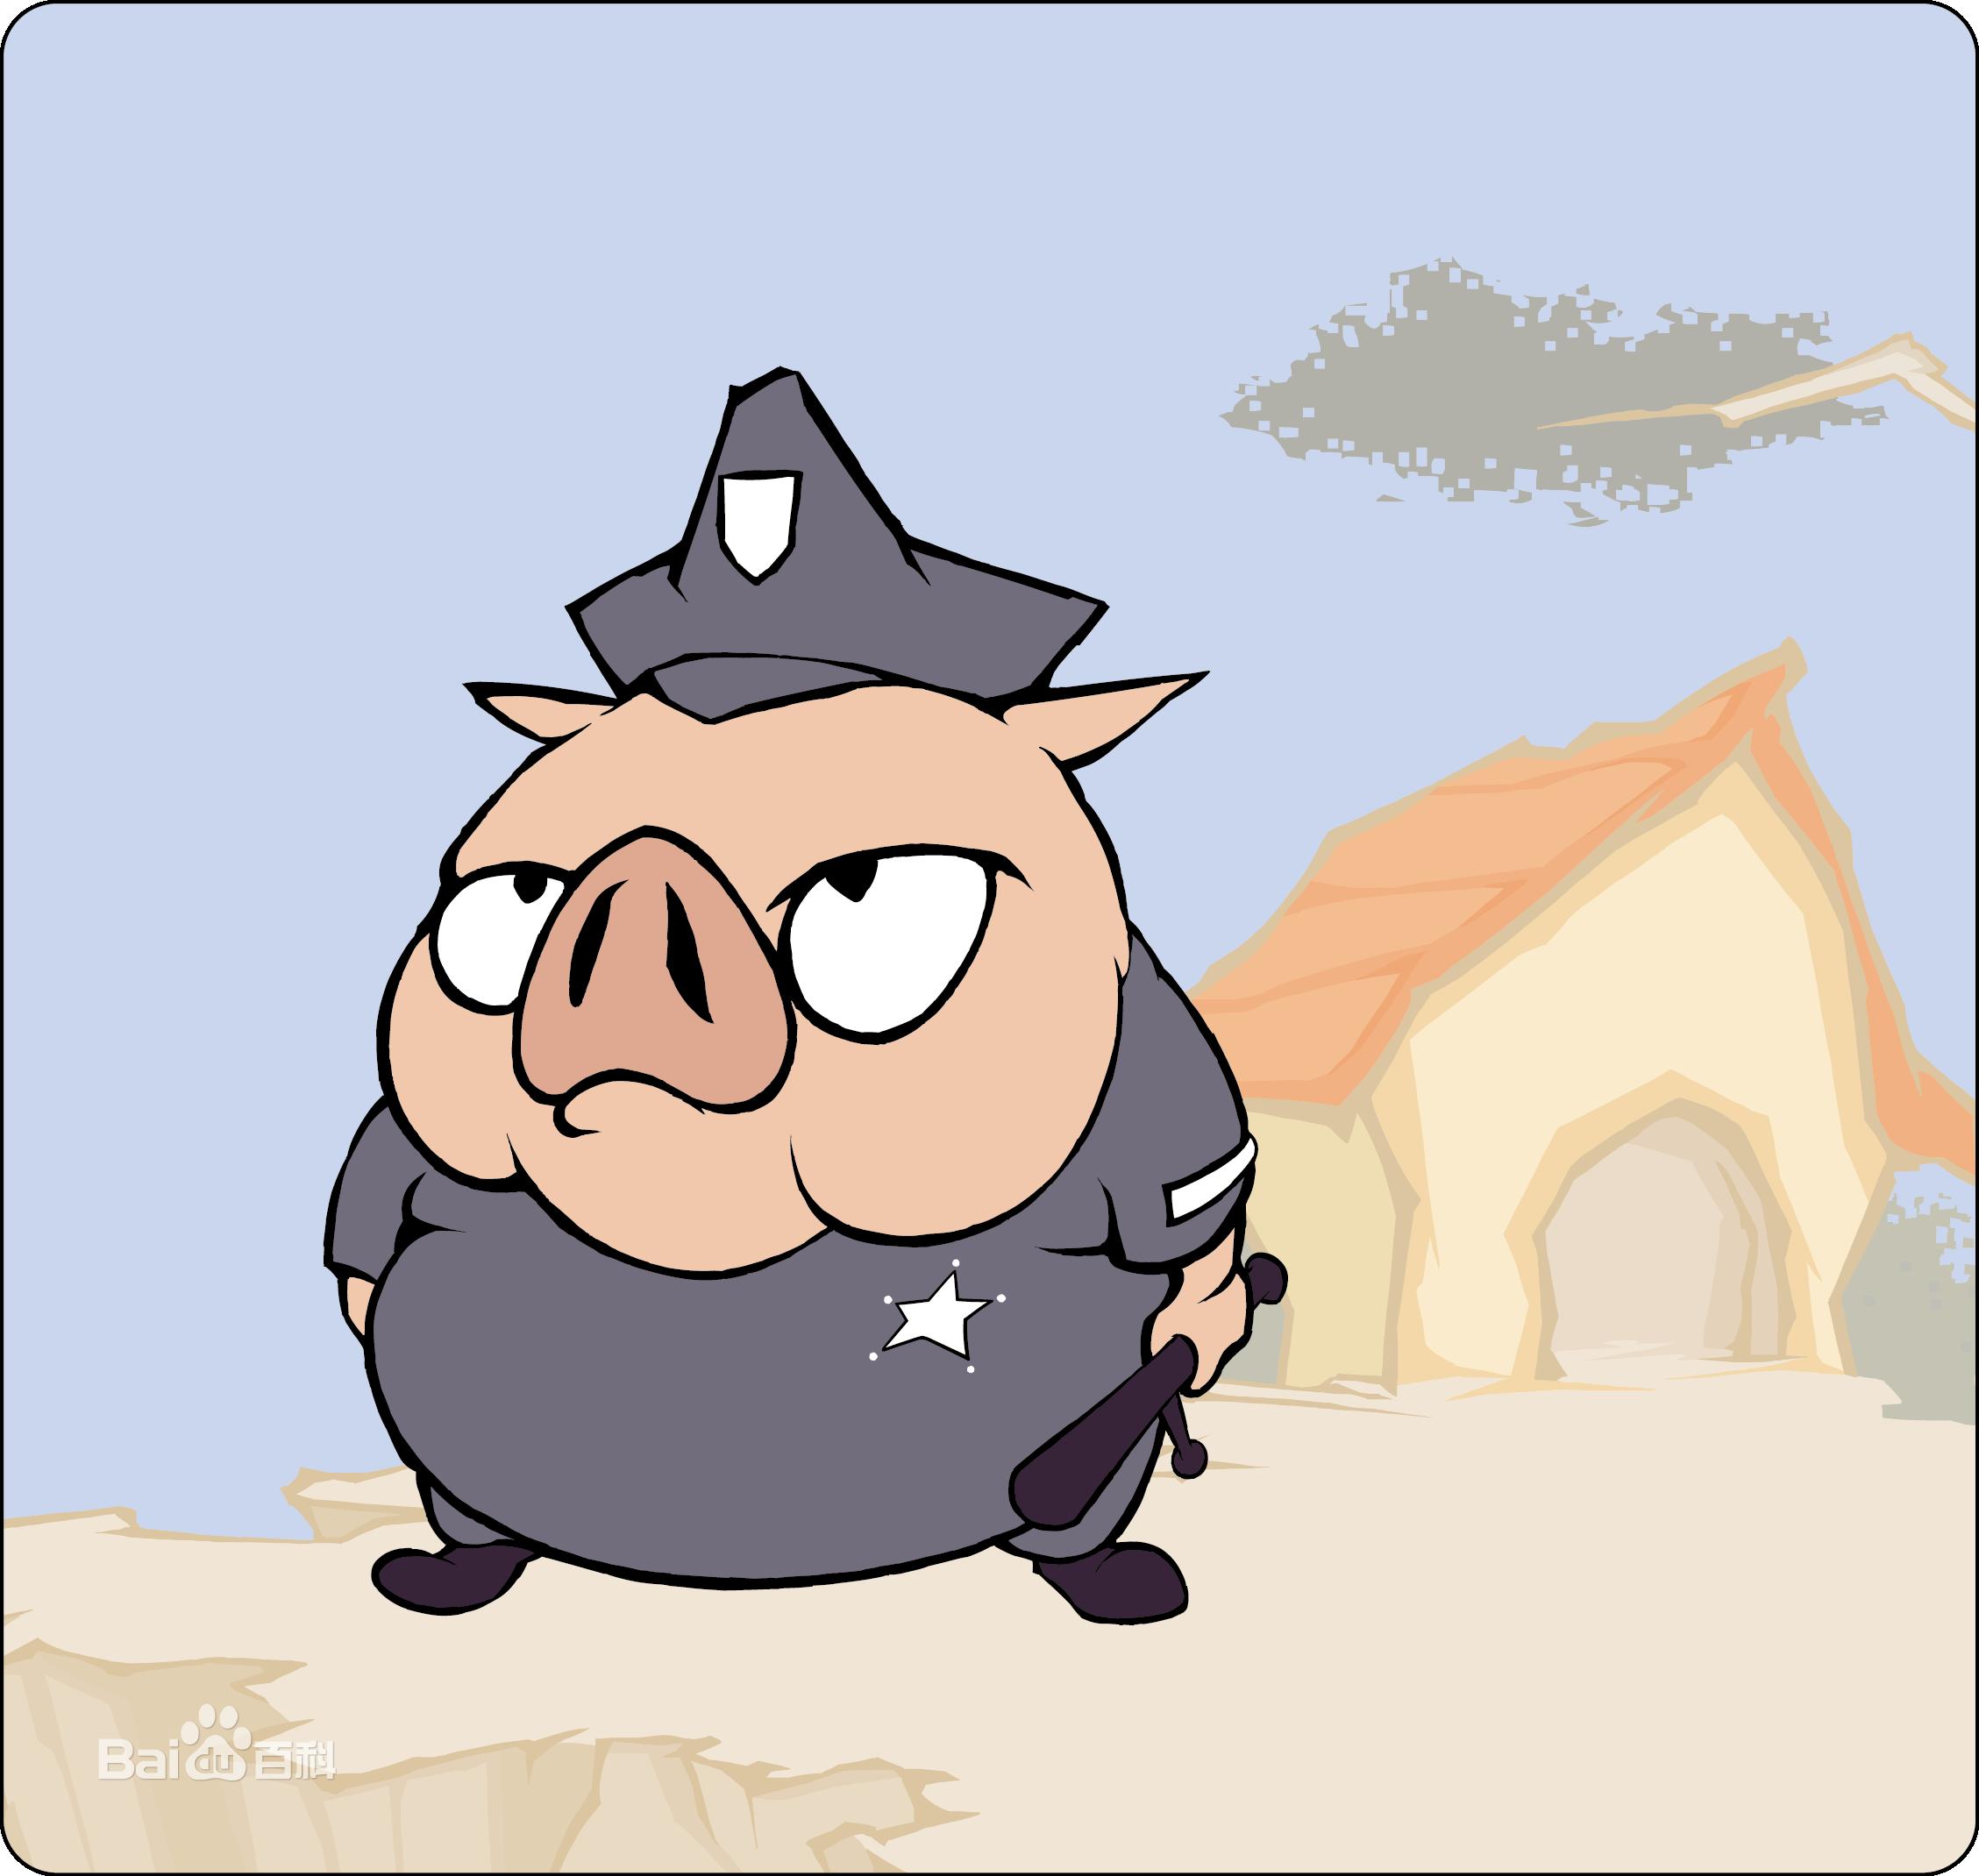 (1) MASHIMARO/蒙蒙兔/流氓兔/贱兔 姓名 : MASHIMARO 生日 : 1999年5月 8日 性格 : 无厘头,少言寡语,胆大机灵,聪明淘气,虽然有点坏坏的, 调皮捣蛋爱捉弄人,但其实本性善良纯真,拥有令人哭笑不得甚至捧腹大笑的超级能力。 特征 : 短小的腿,胖胖的身躯,一条线的眼睛,特有的无表情面相,谁都不知道他在想什么! (2) Boogaloo & Booma 姓名: Boogaloo & Booma(熊父子) 性格: 胆小的Boogaloo和他的儿子Booma,森